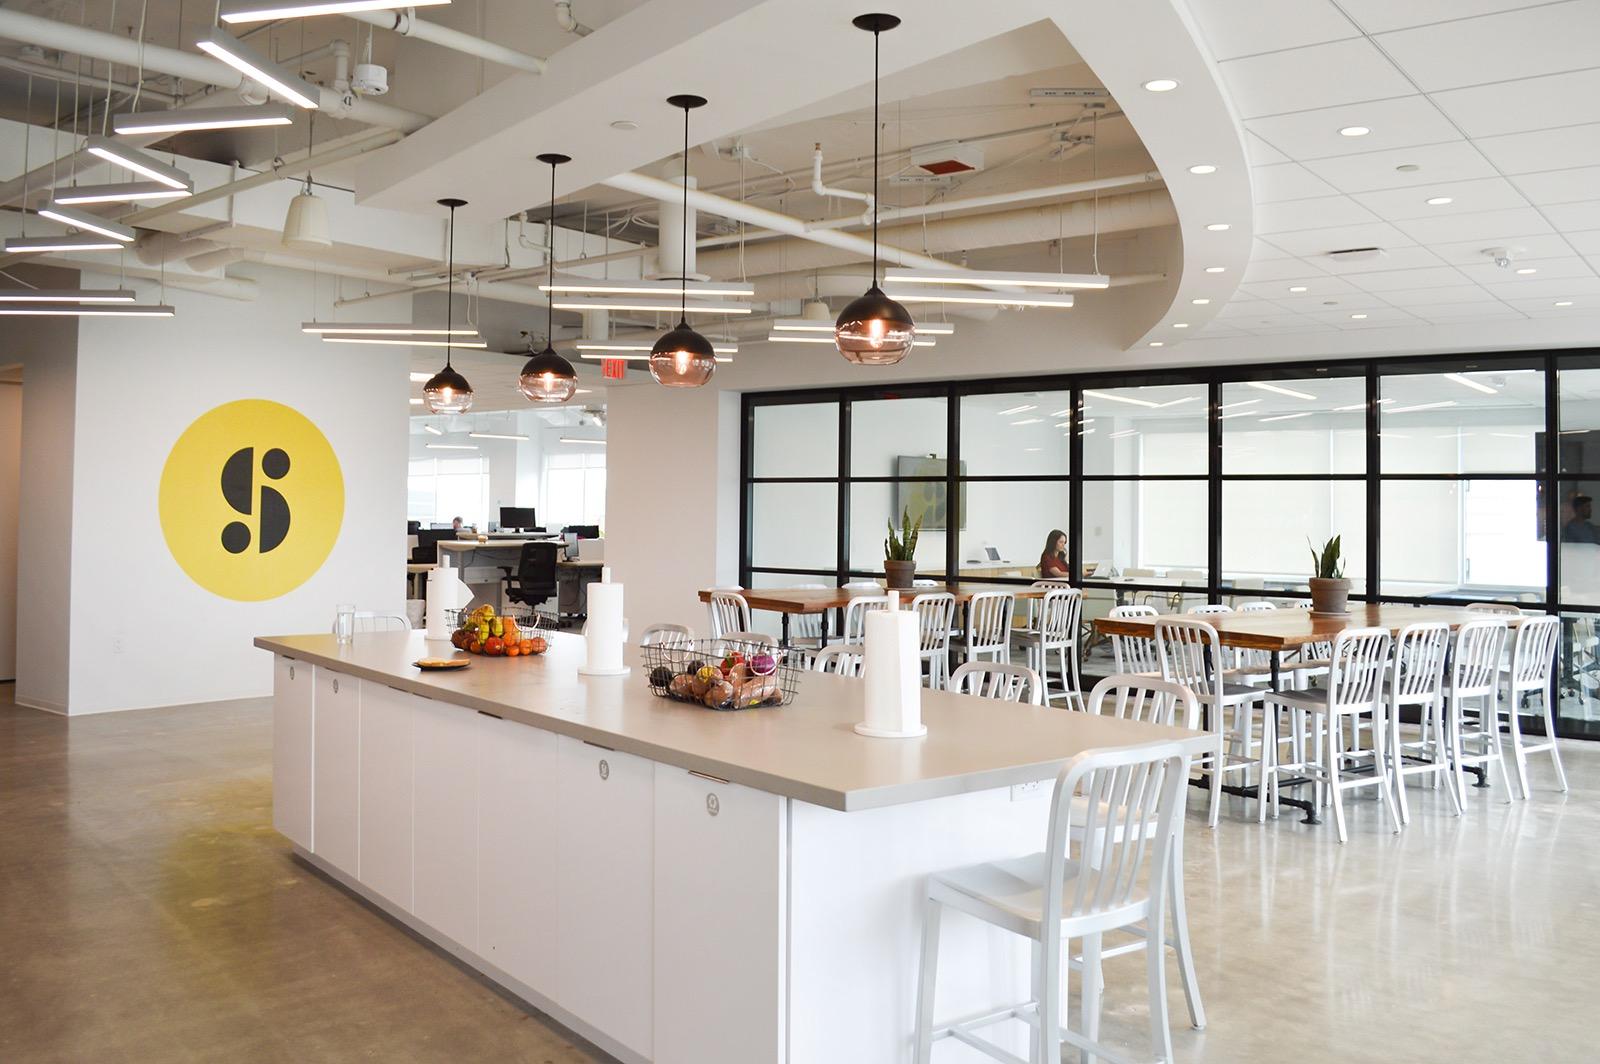 beats by dre office. entrance kitchen breakout space beats by dre office